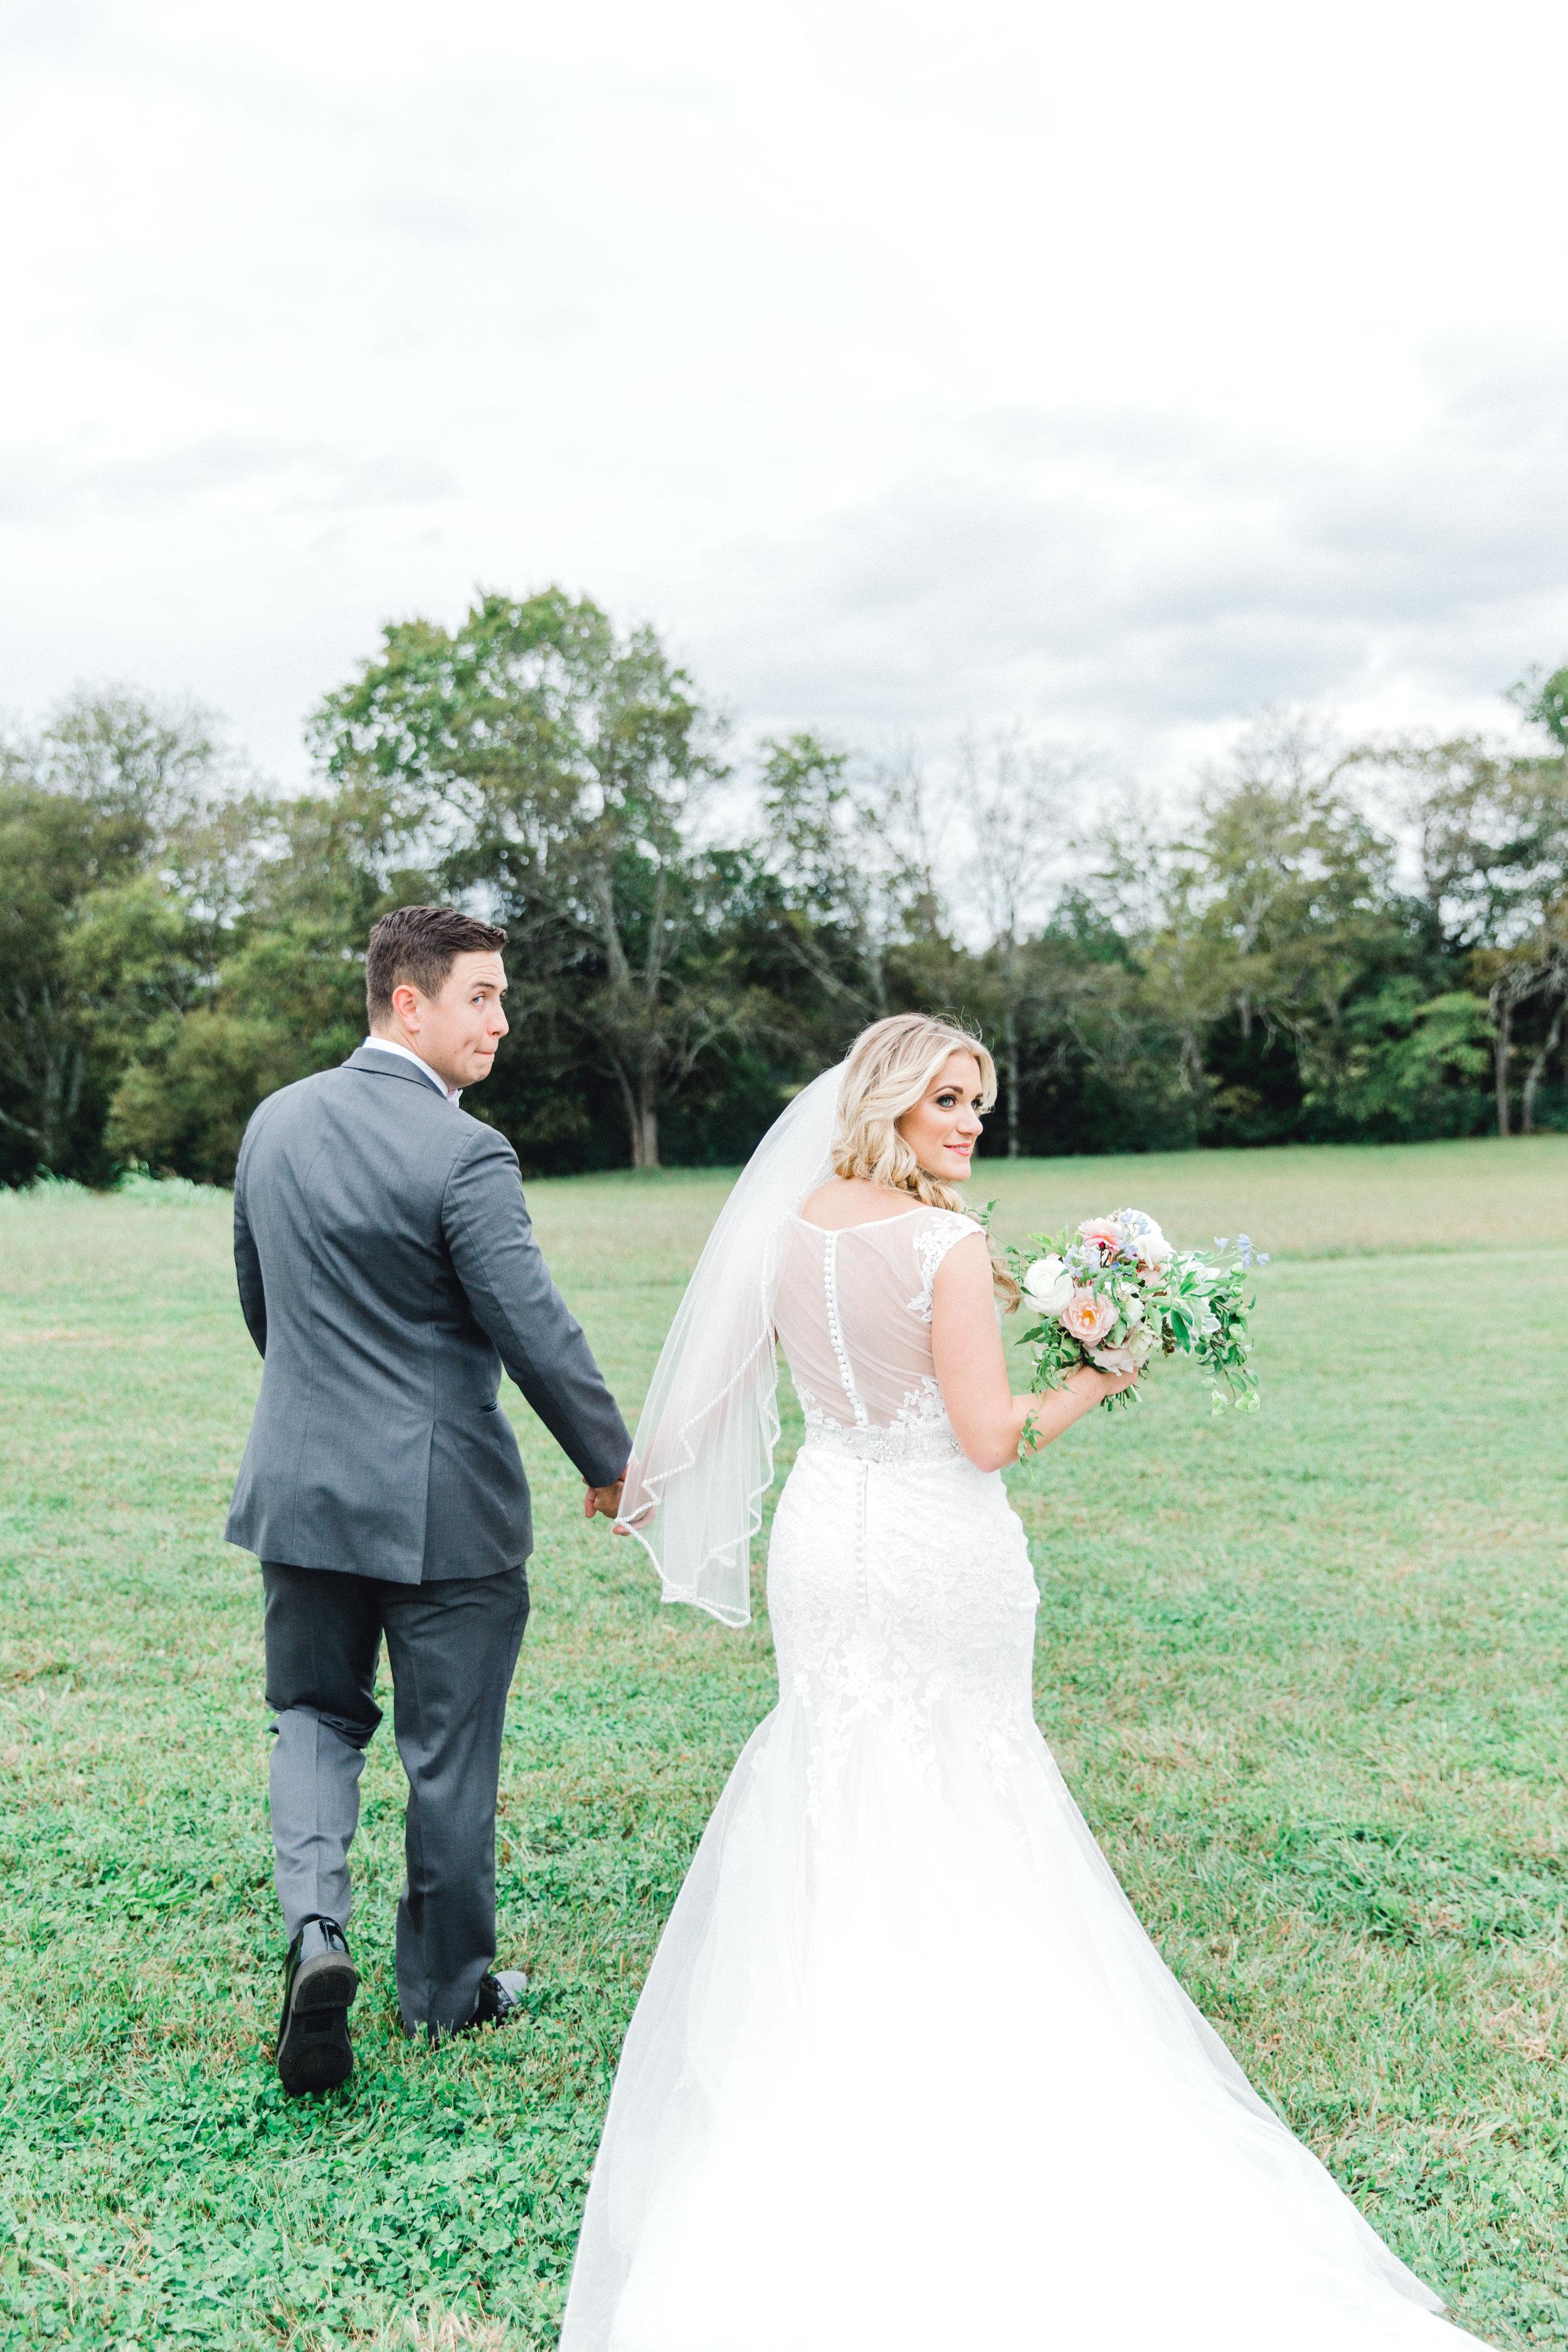 Paige-Mercer-Photography-Florida-Wedding-Photographer-Alyssa&Drew-55.jpg